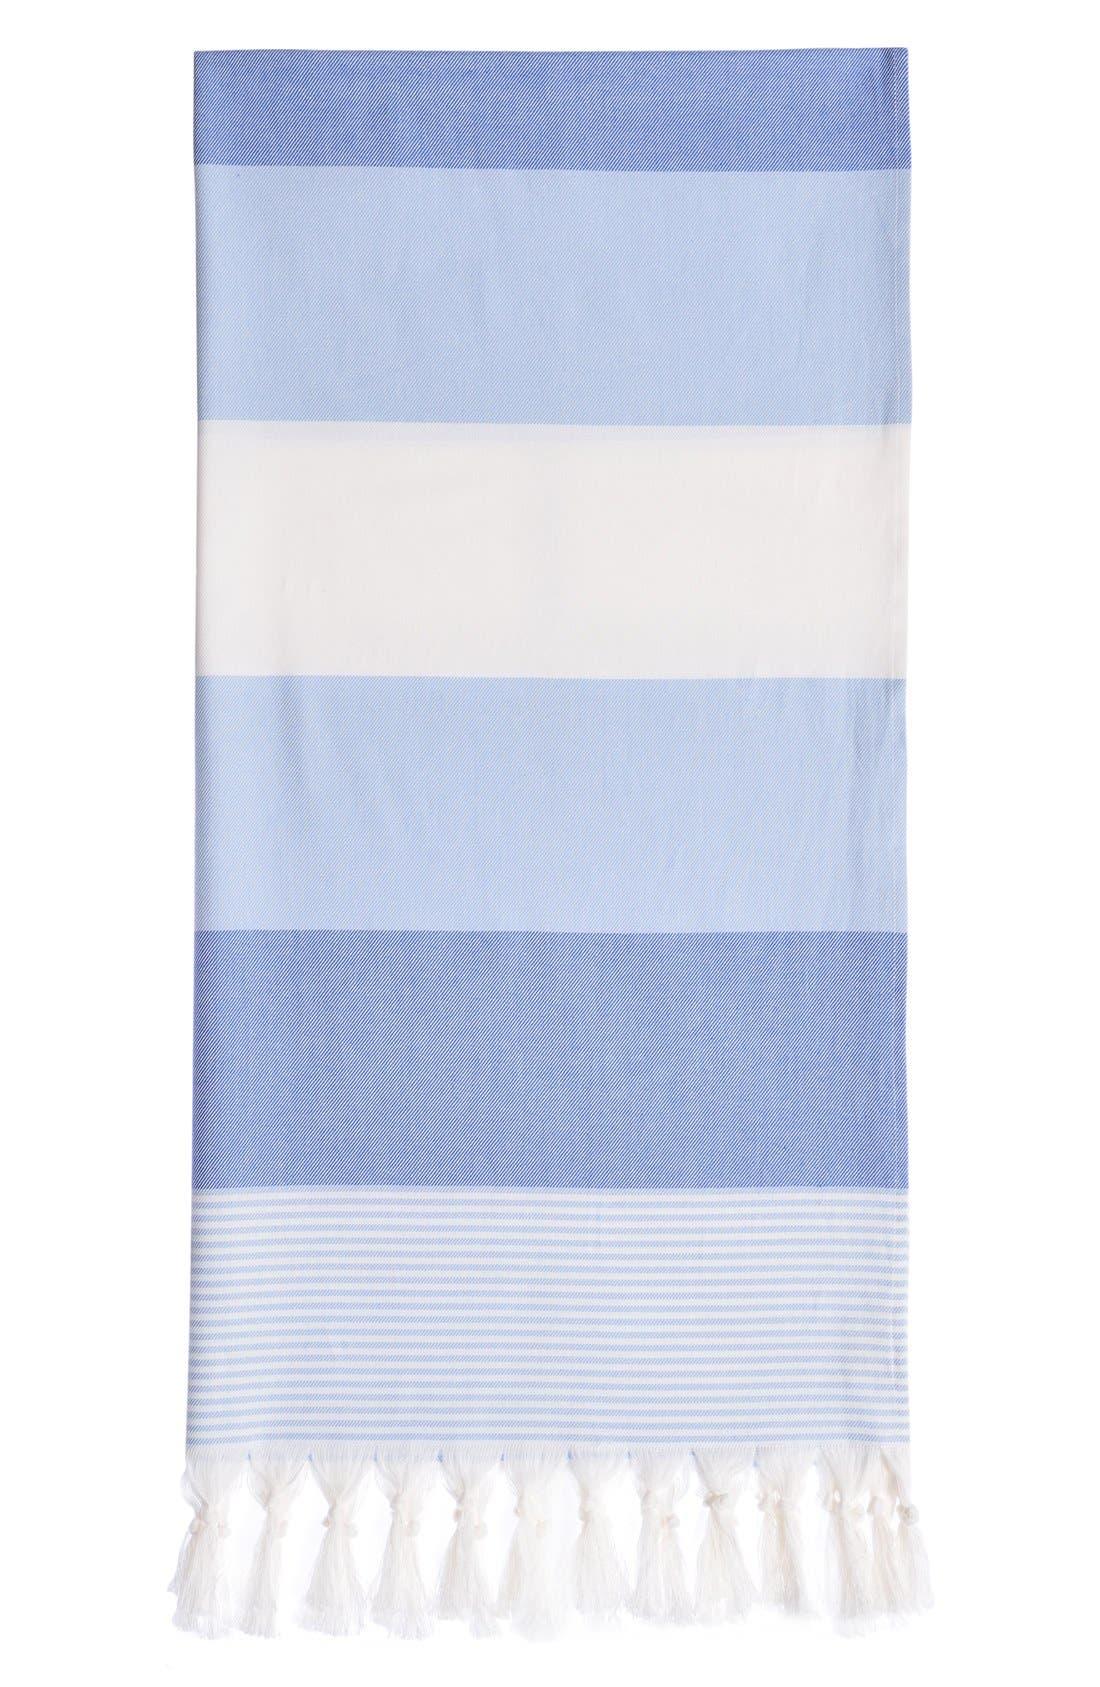 'Sea Waves' Turkish Pestemal Towel,                         Main,                         color, Ocean Blue